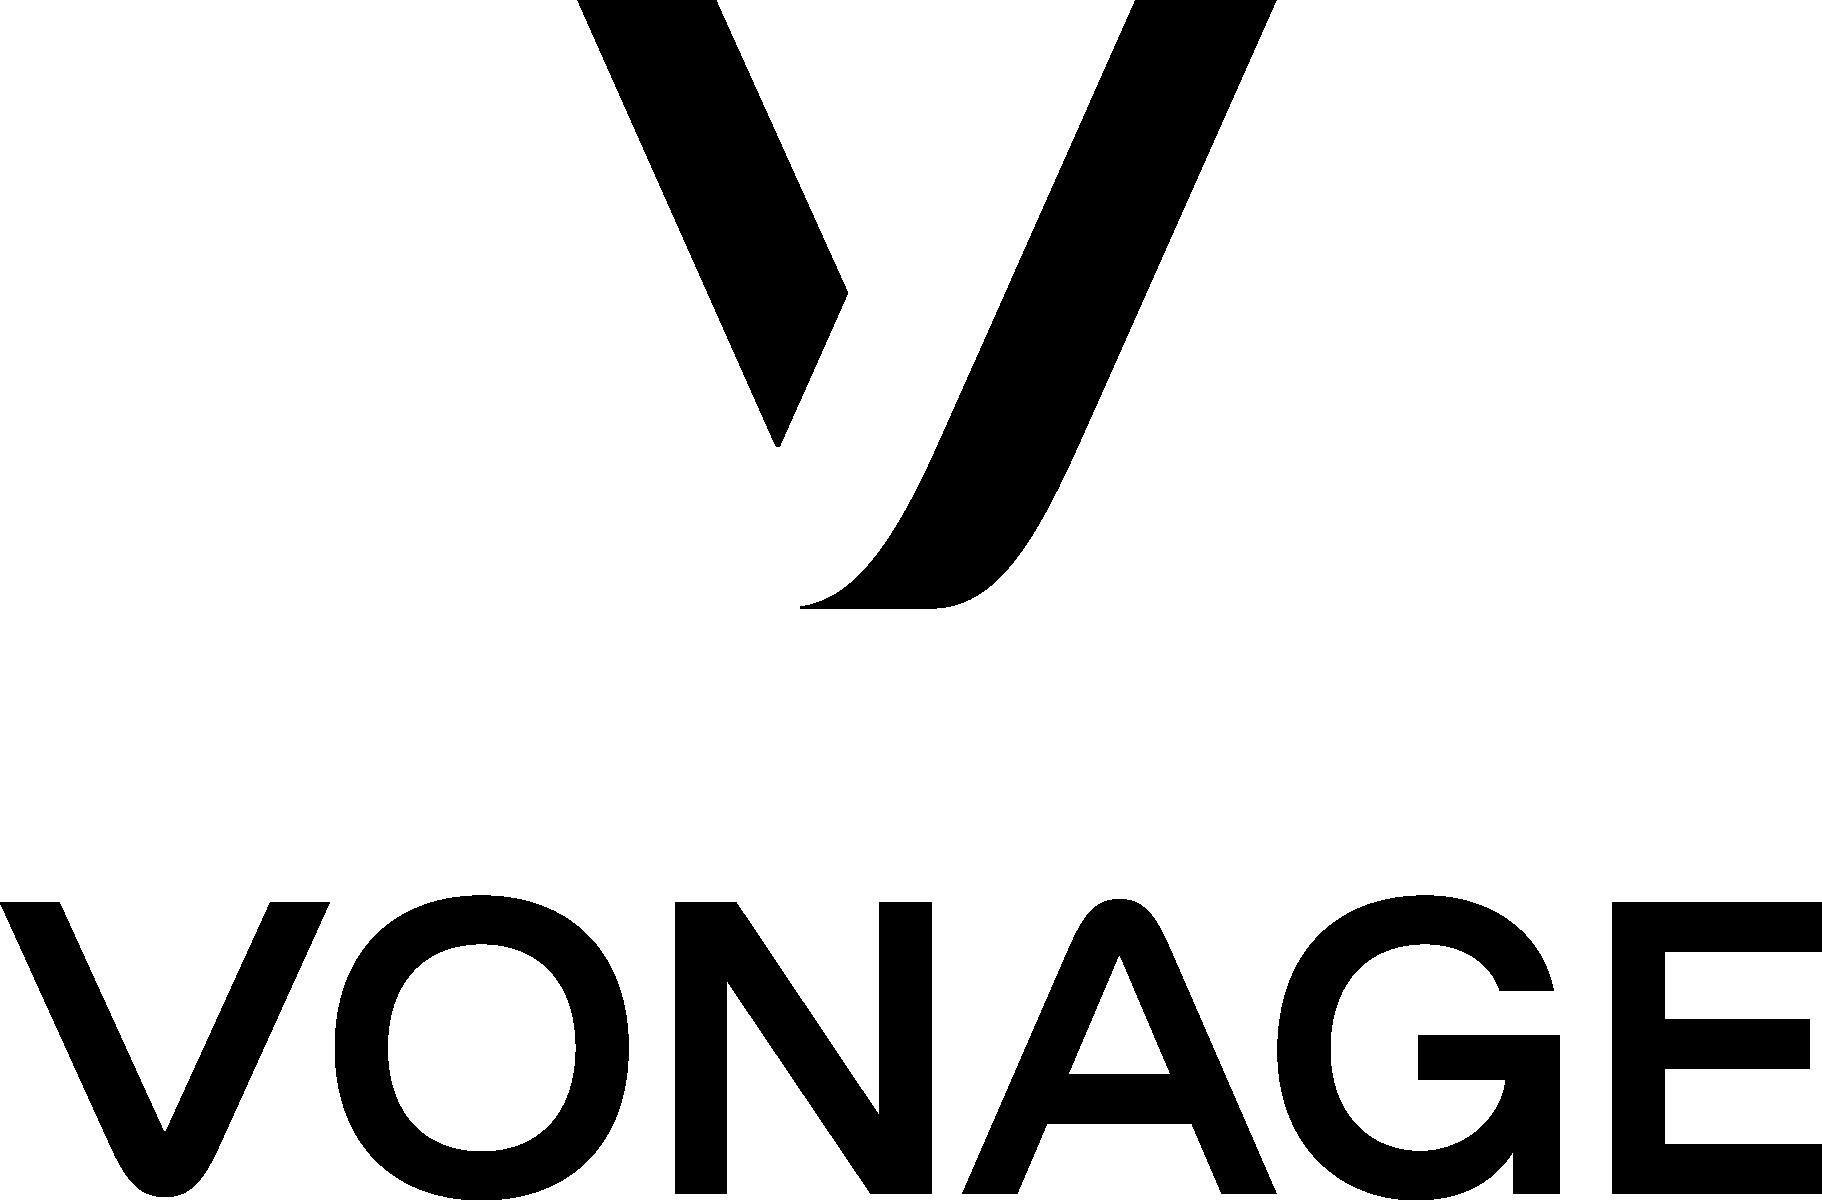 vonagelogo-secondary-black